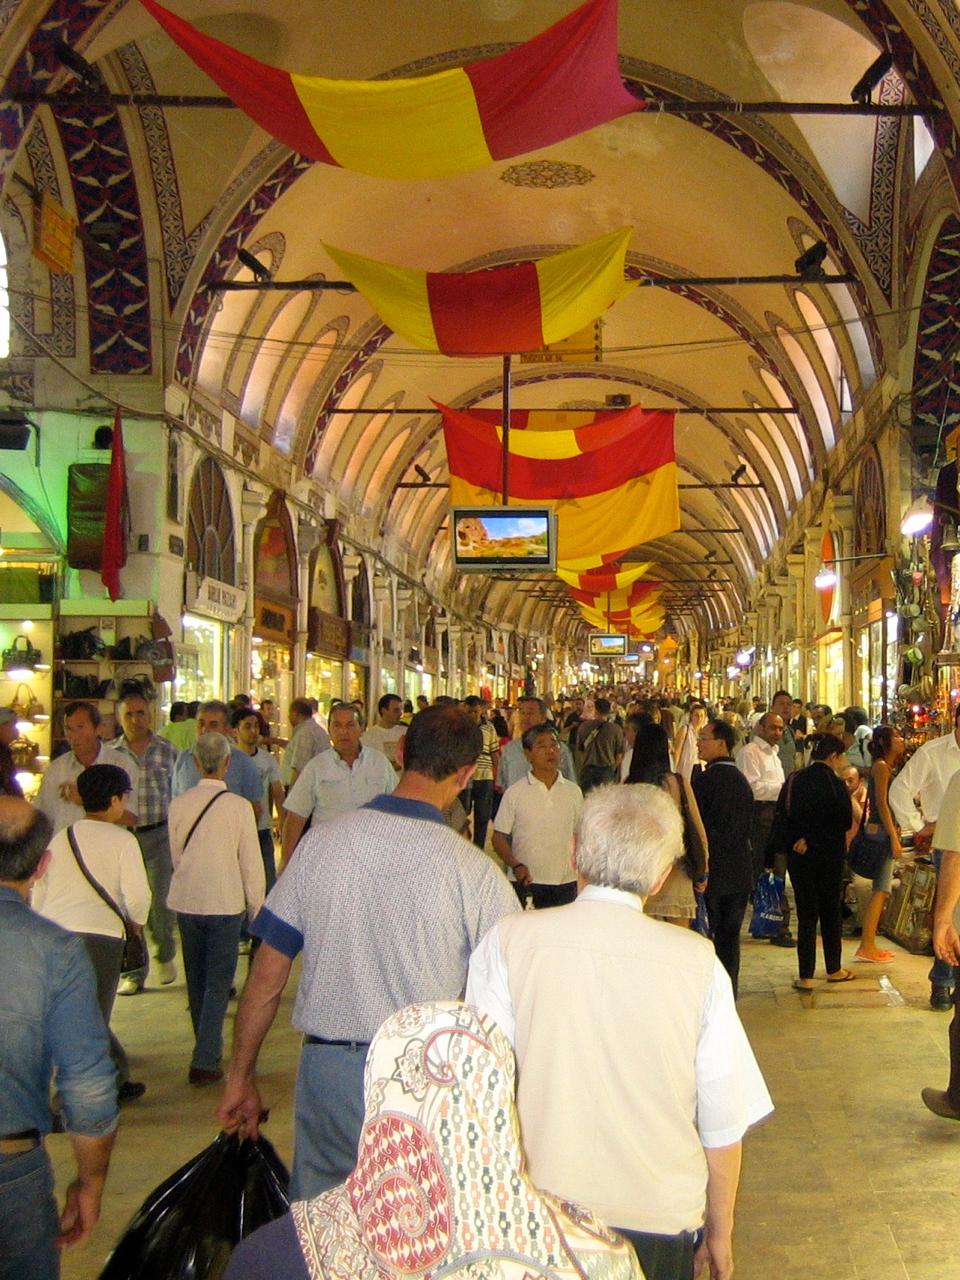 Goldmarkt Kapali Carsi Istanbul